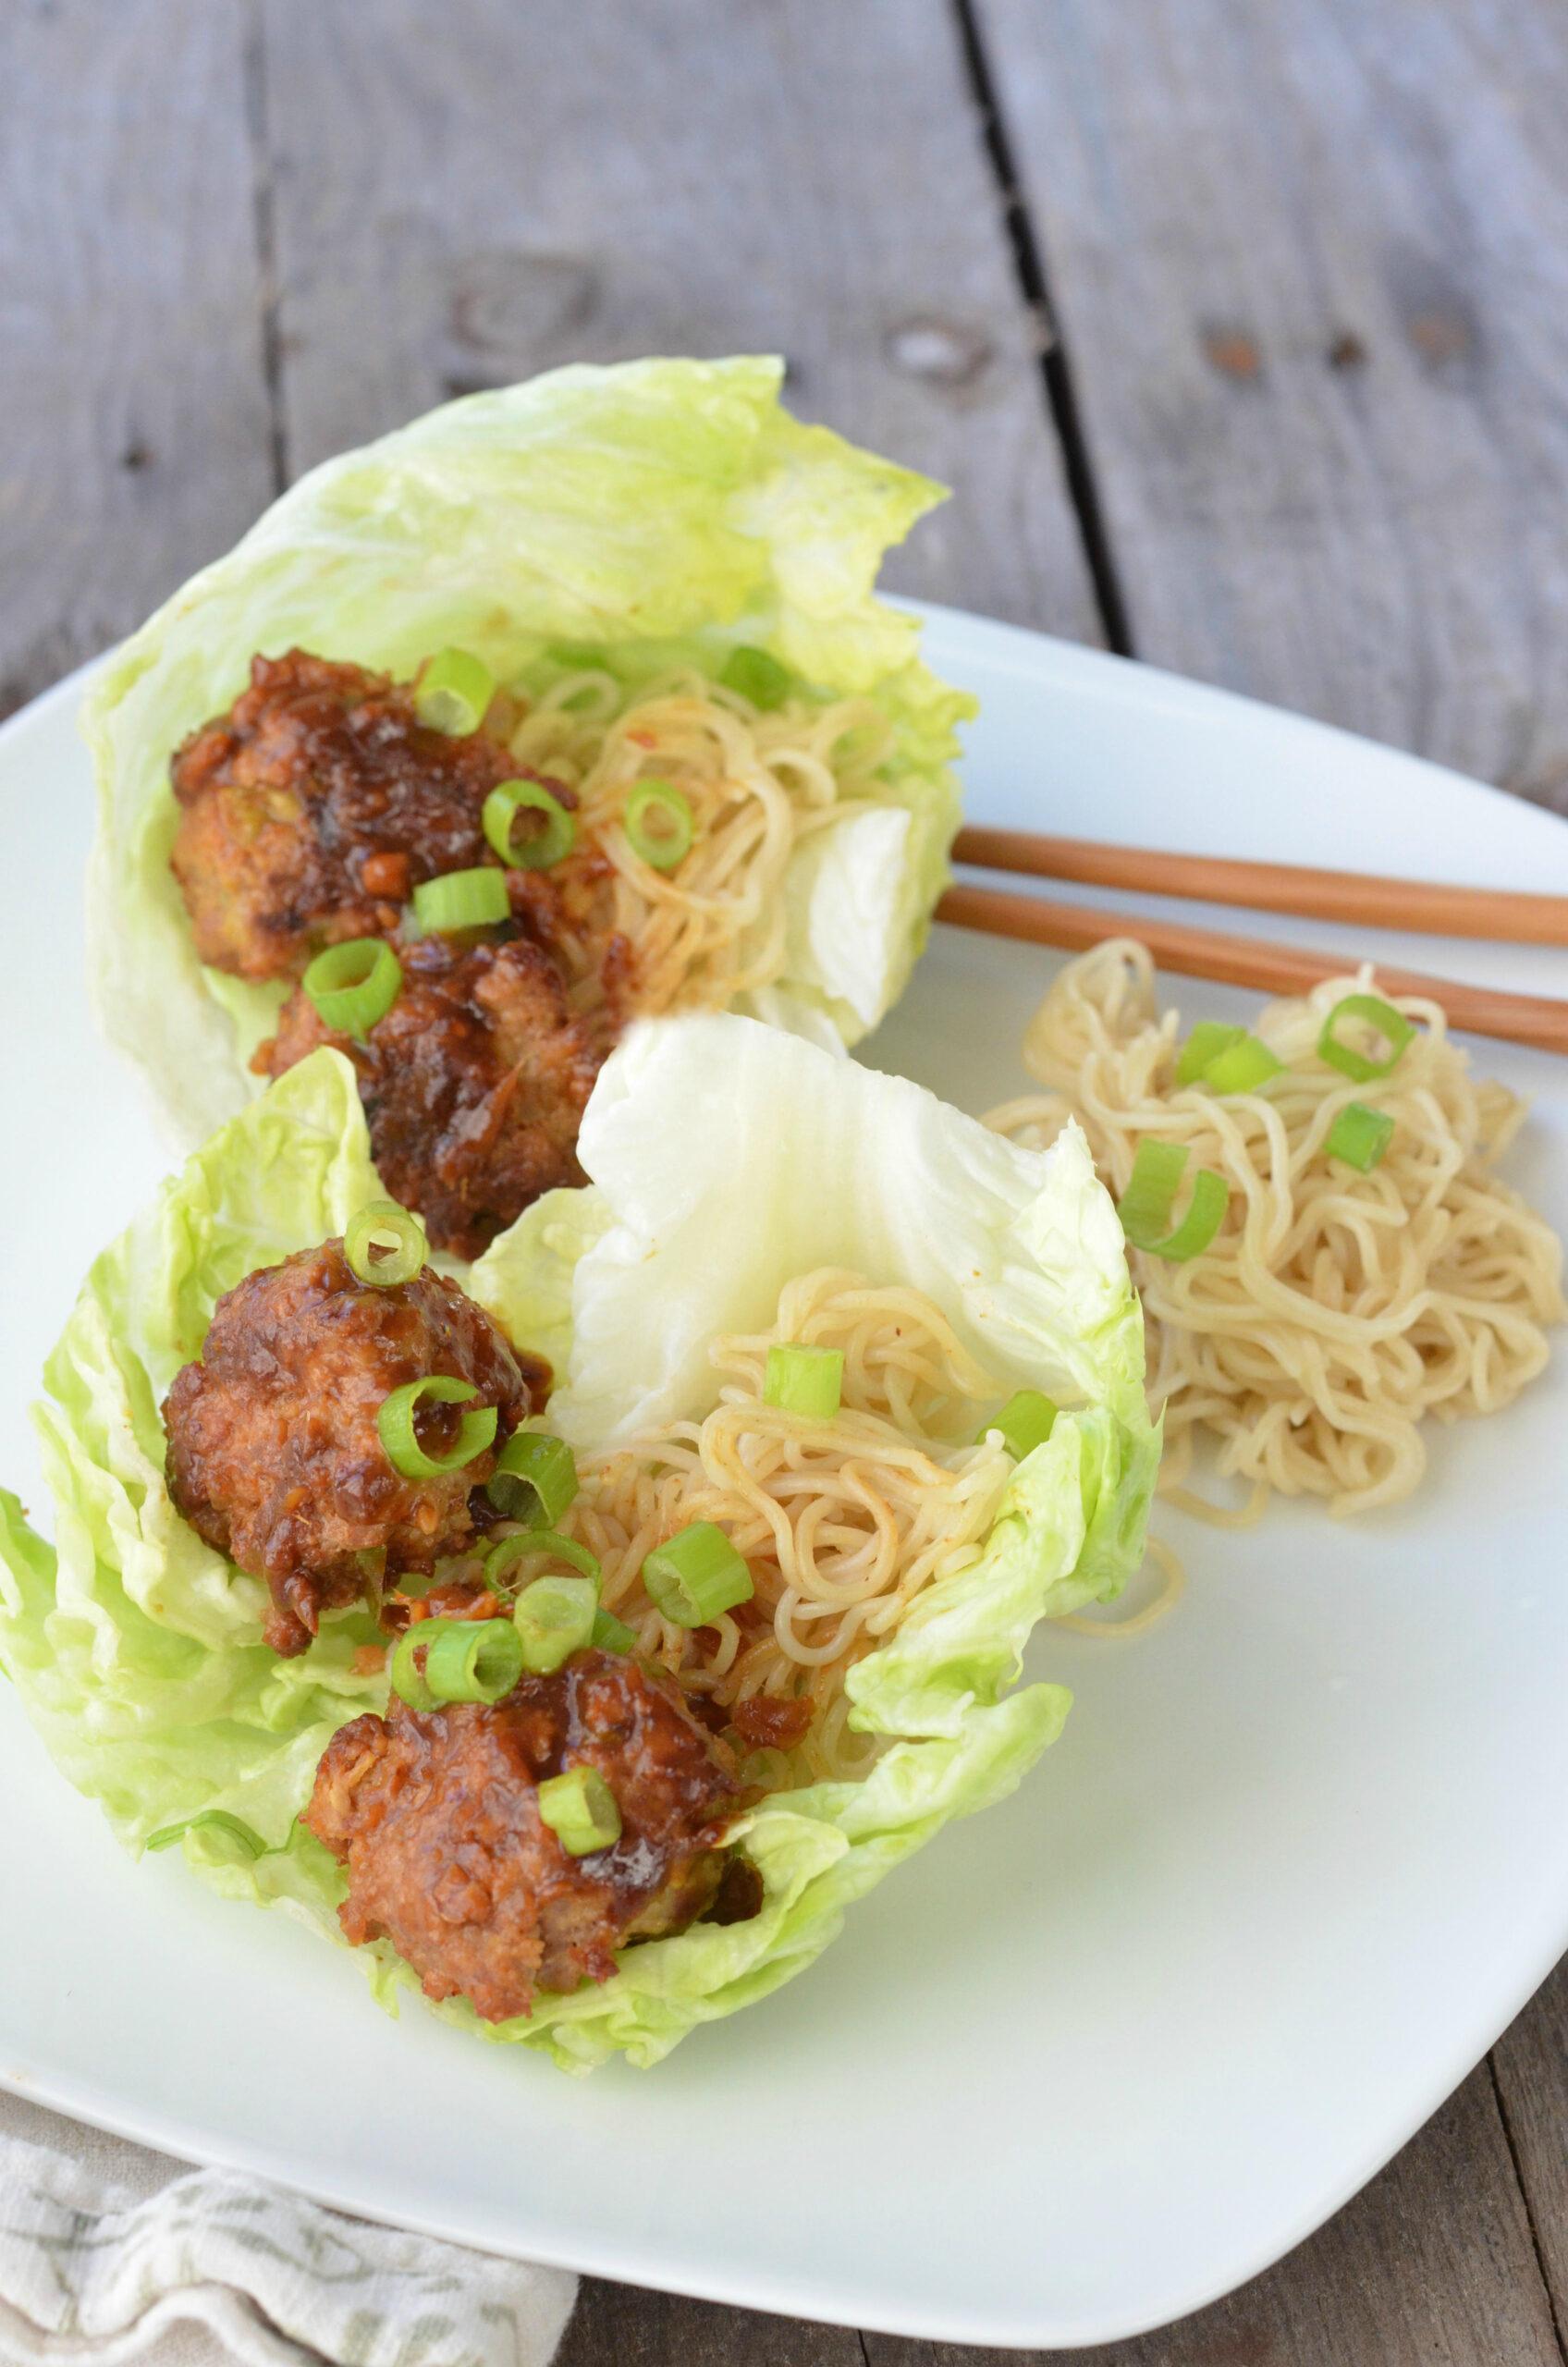 Meatball lettuce wrap recipe with teriyaki glaze